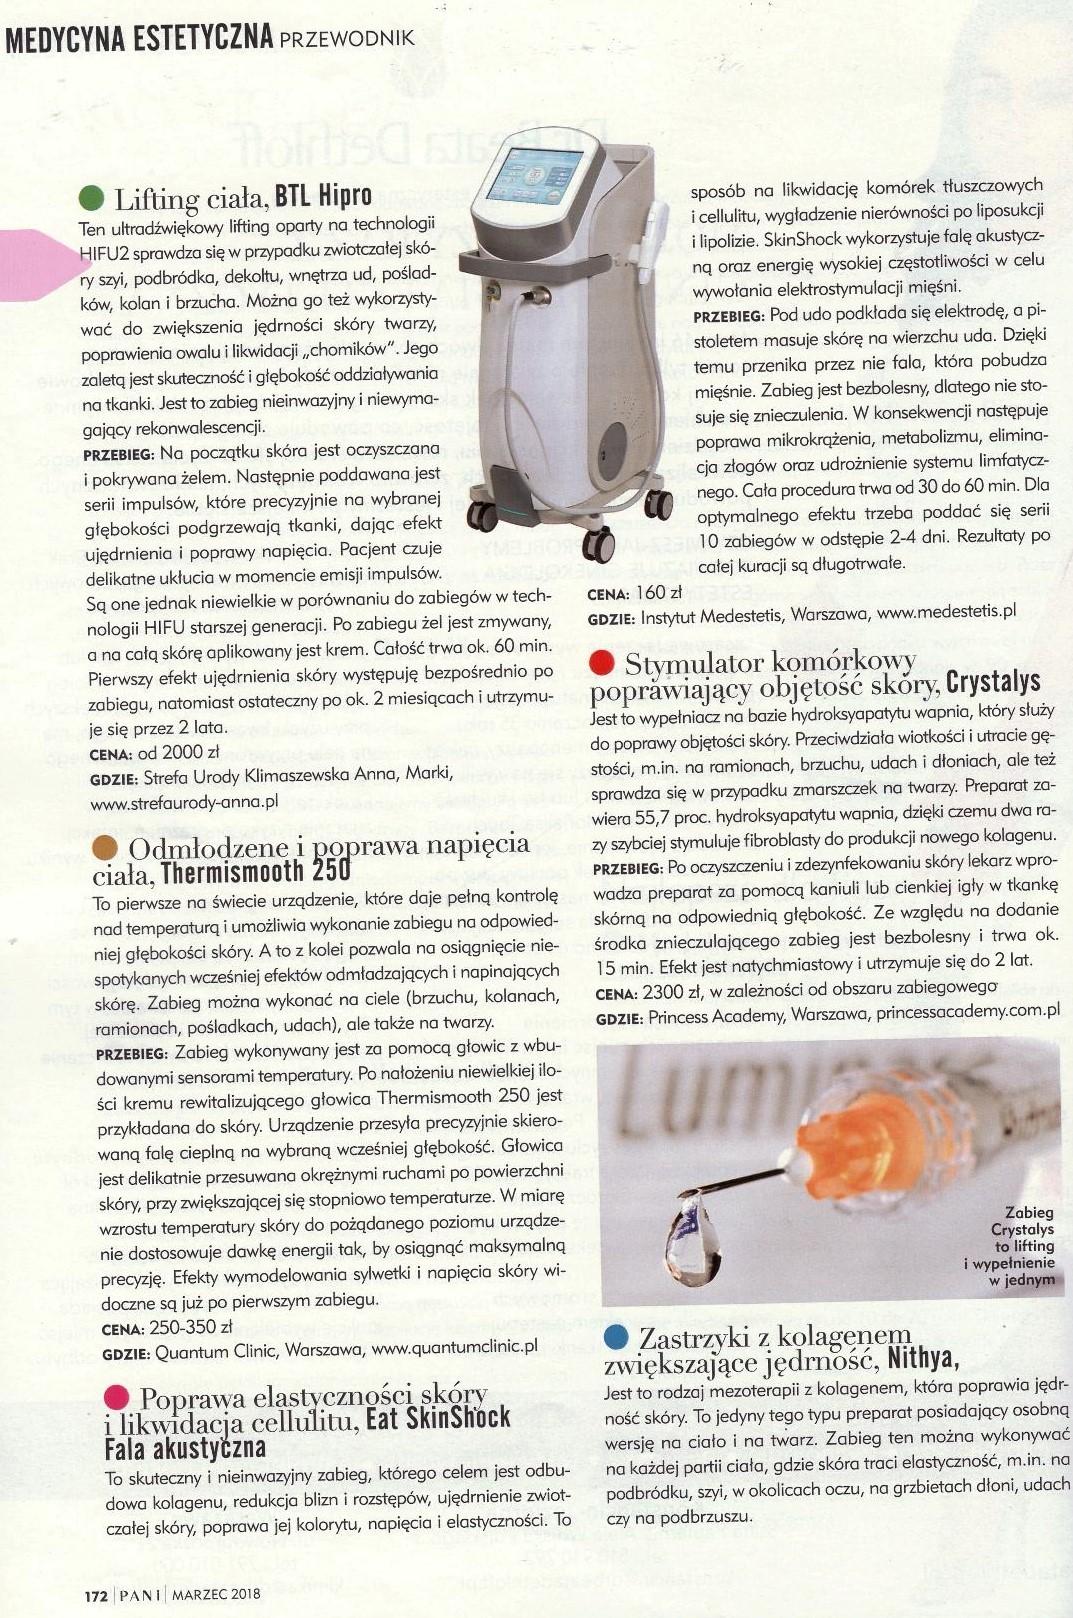 pani_marzec2018-page-004